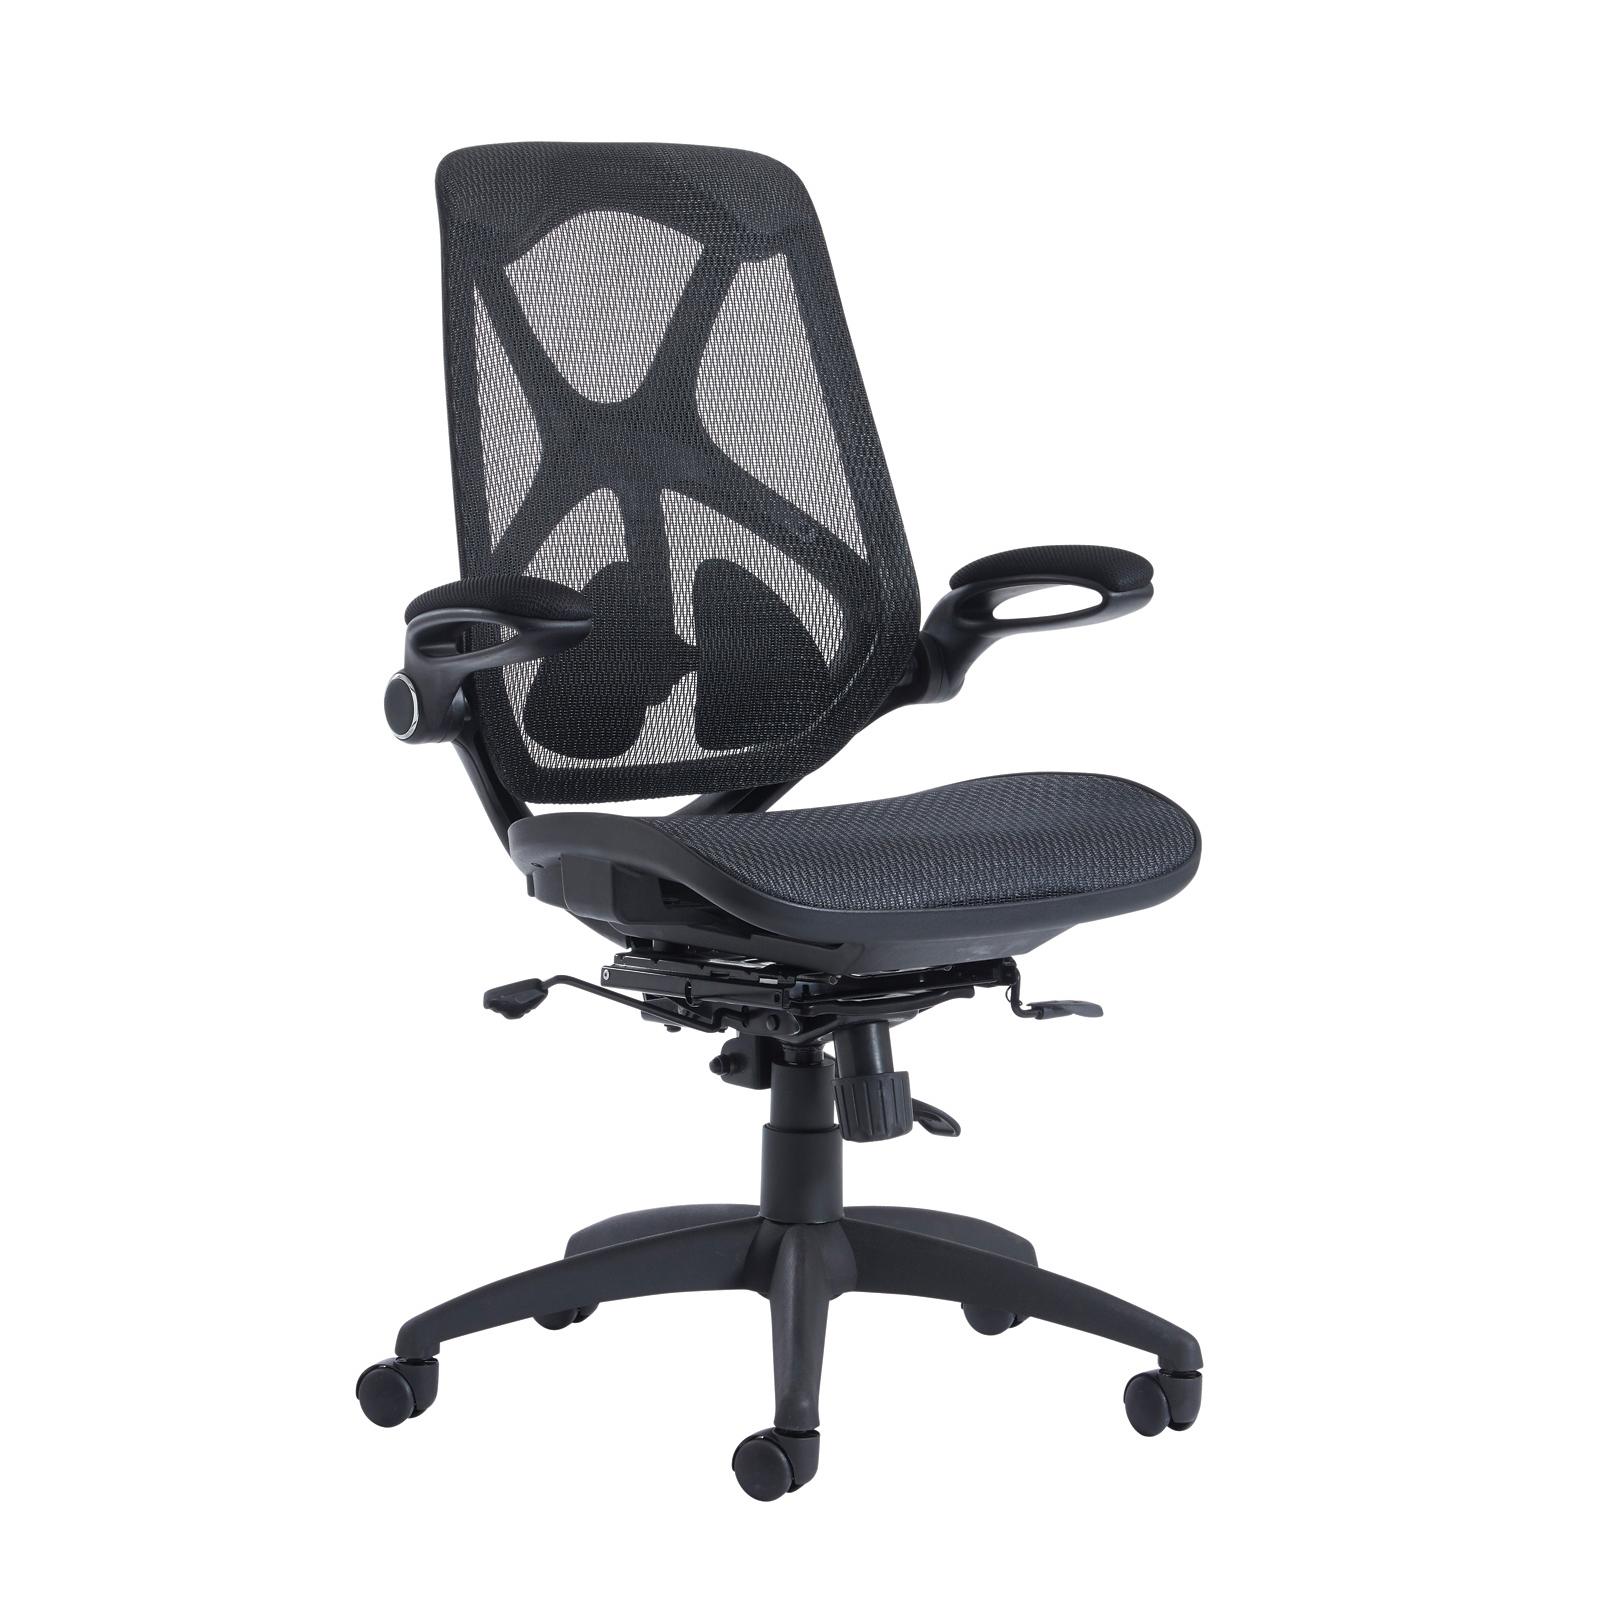 Desks Napier high mesh back operator chair with mesh seat - black